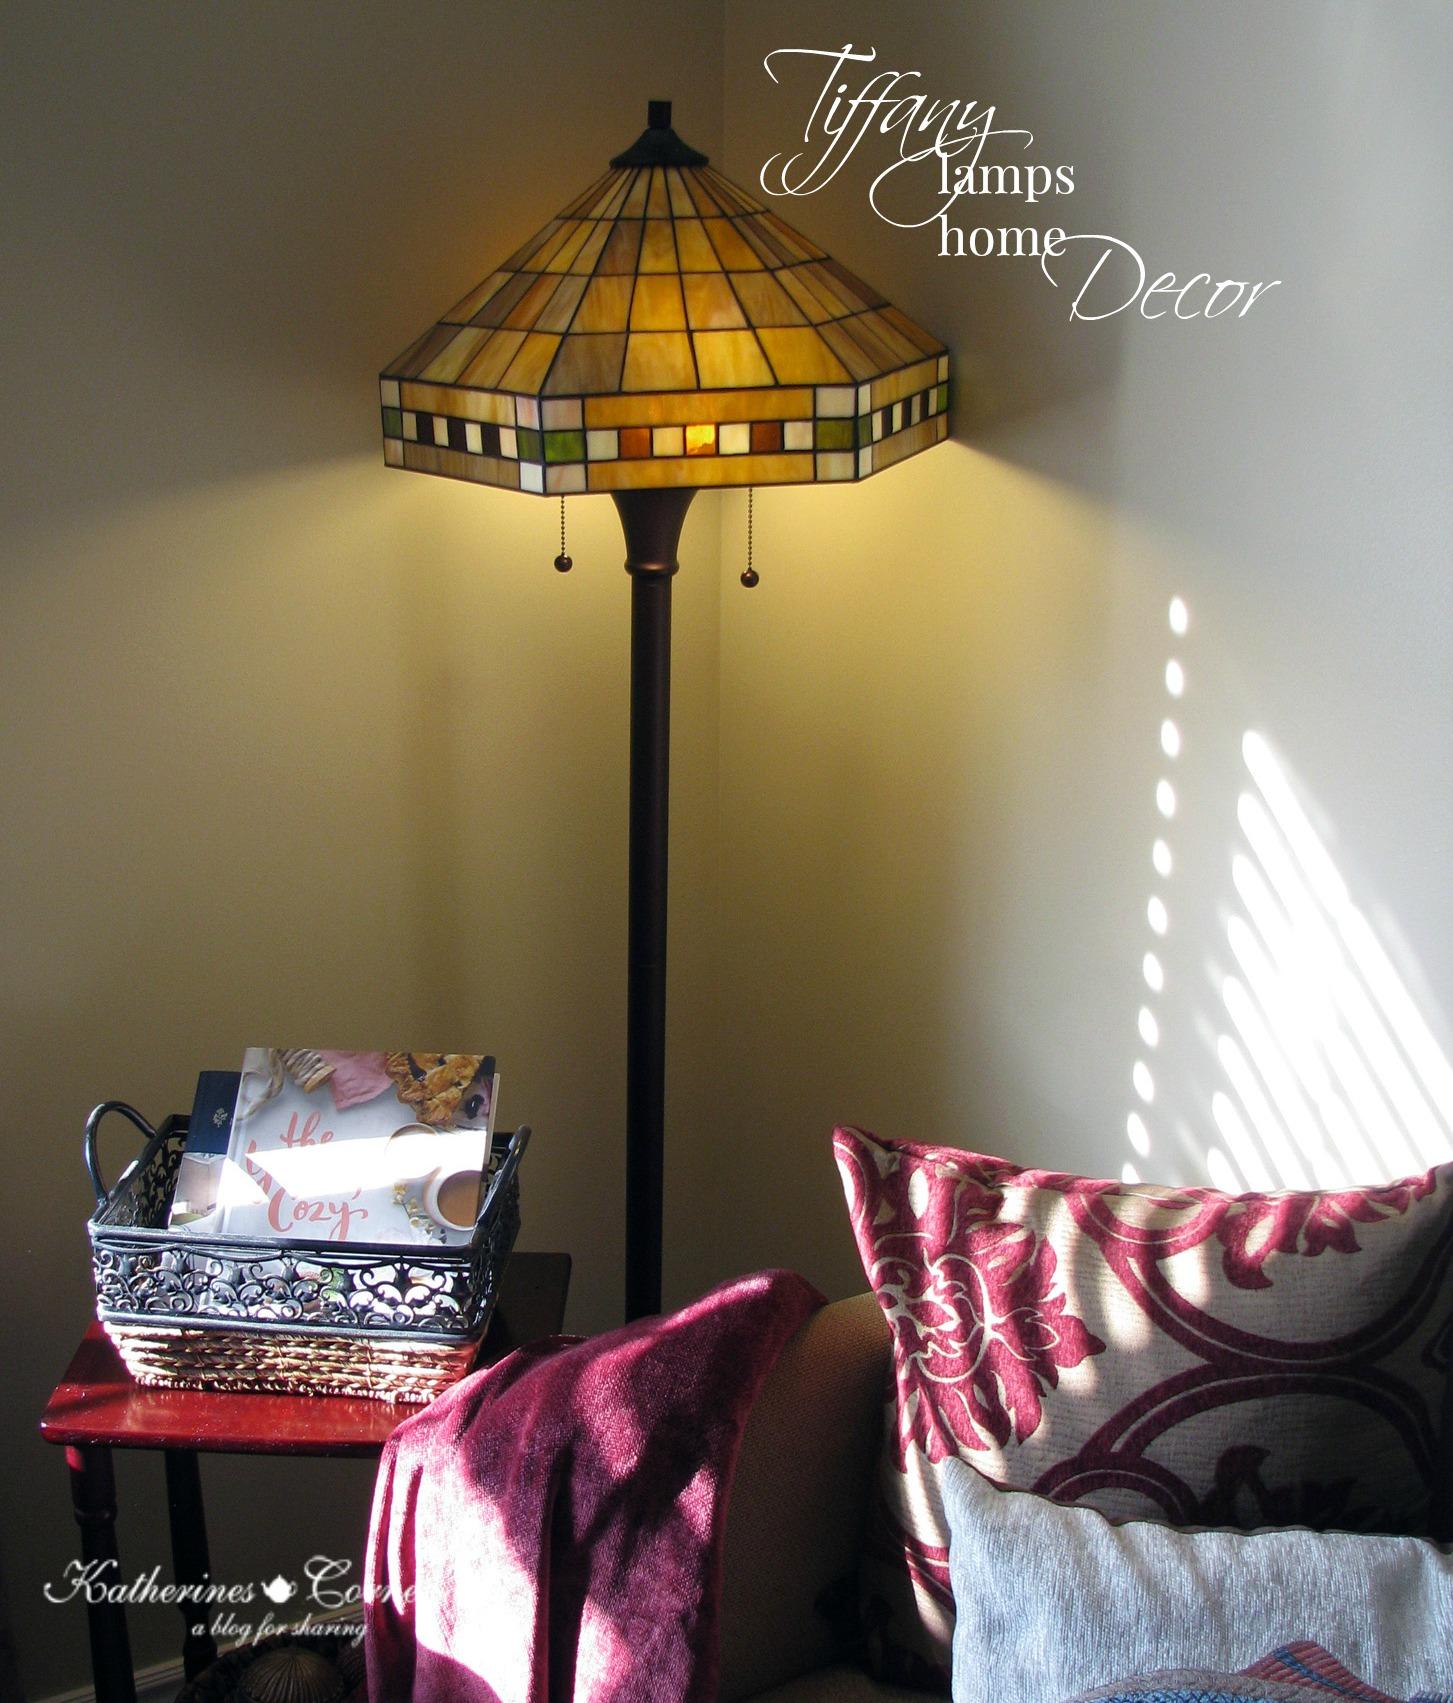 Tiffany Lamps Home Decor